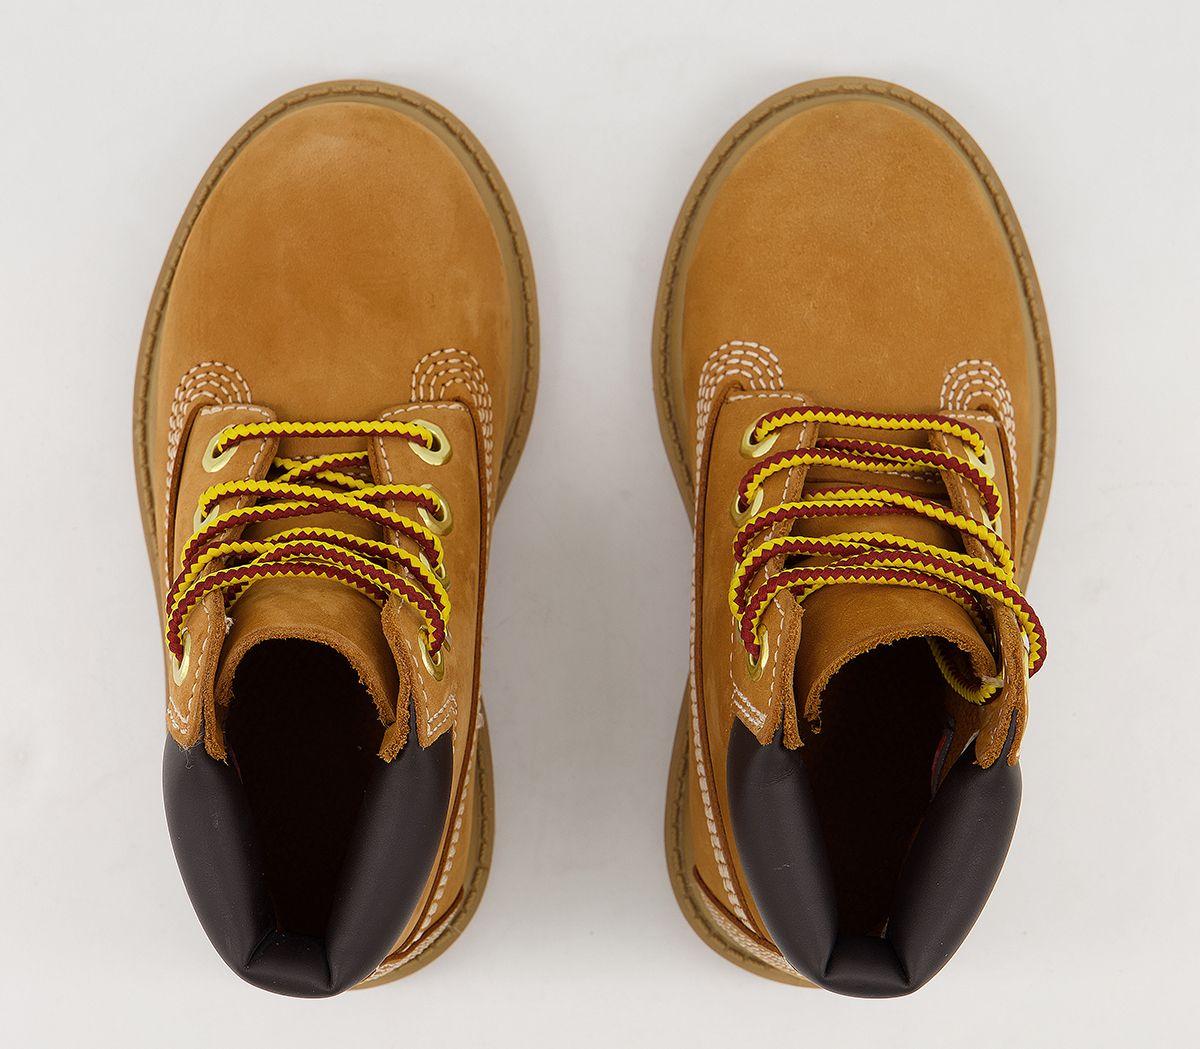 541eadb67401d2 Kids Timberland 6 Inch Classic Boots Infant Wheat Nubuck Kids   eBay